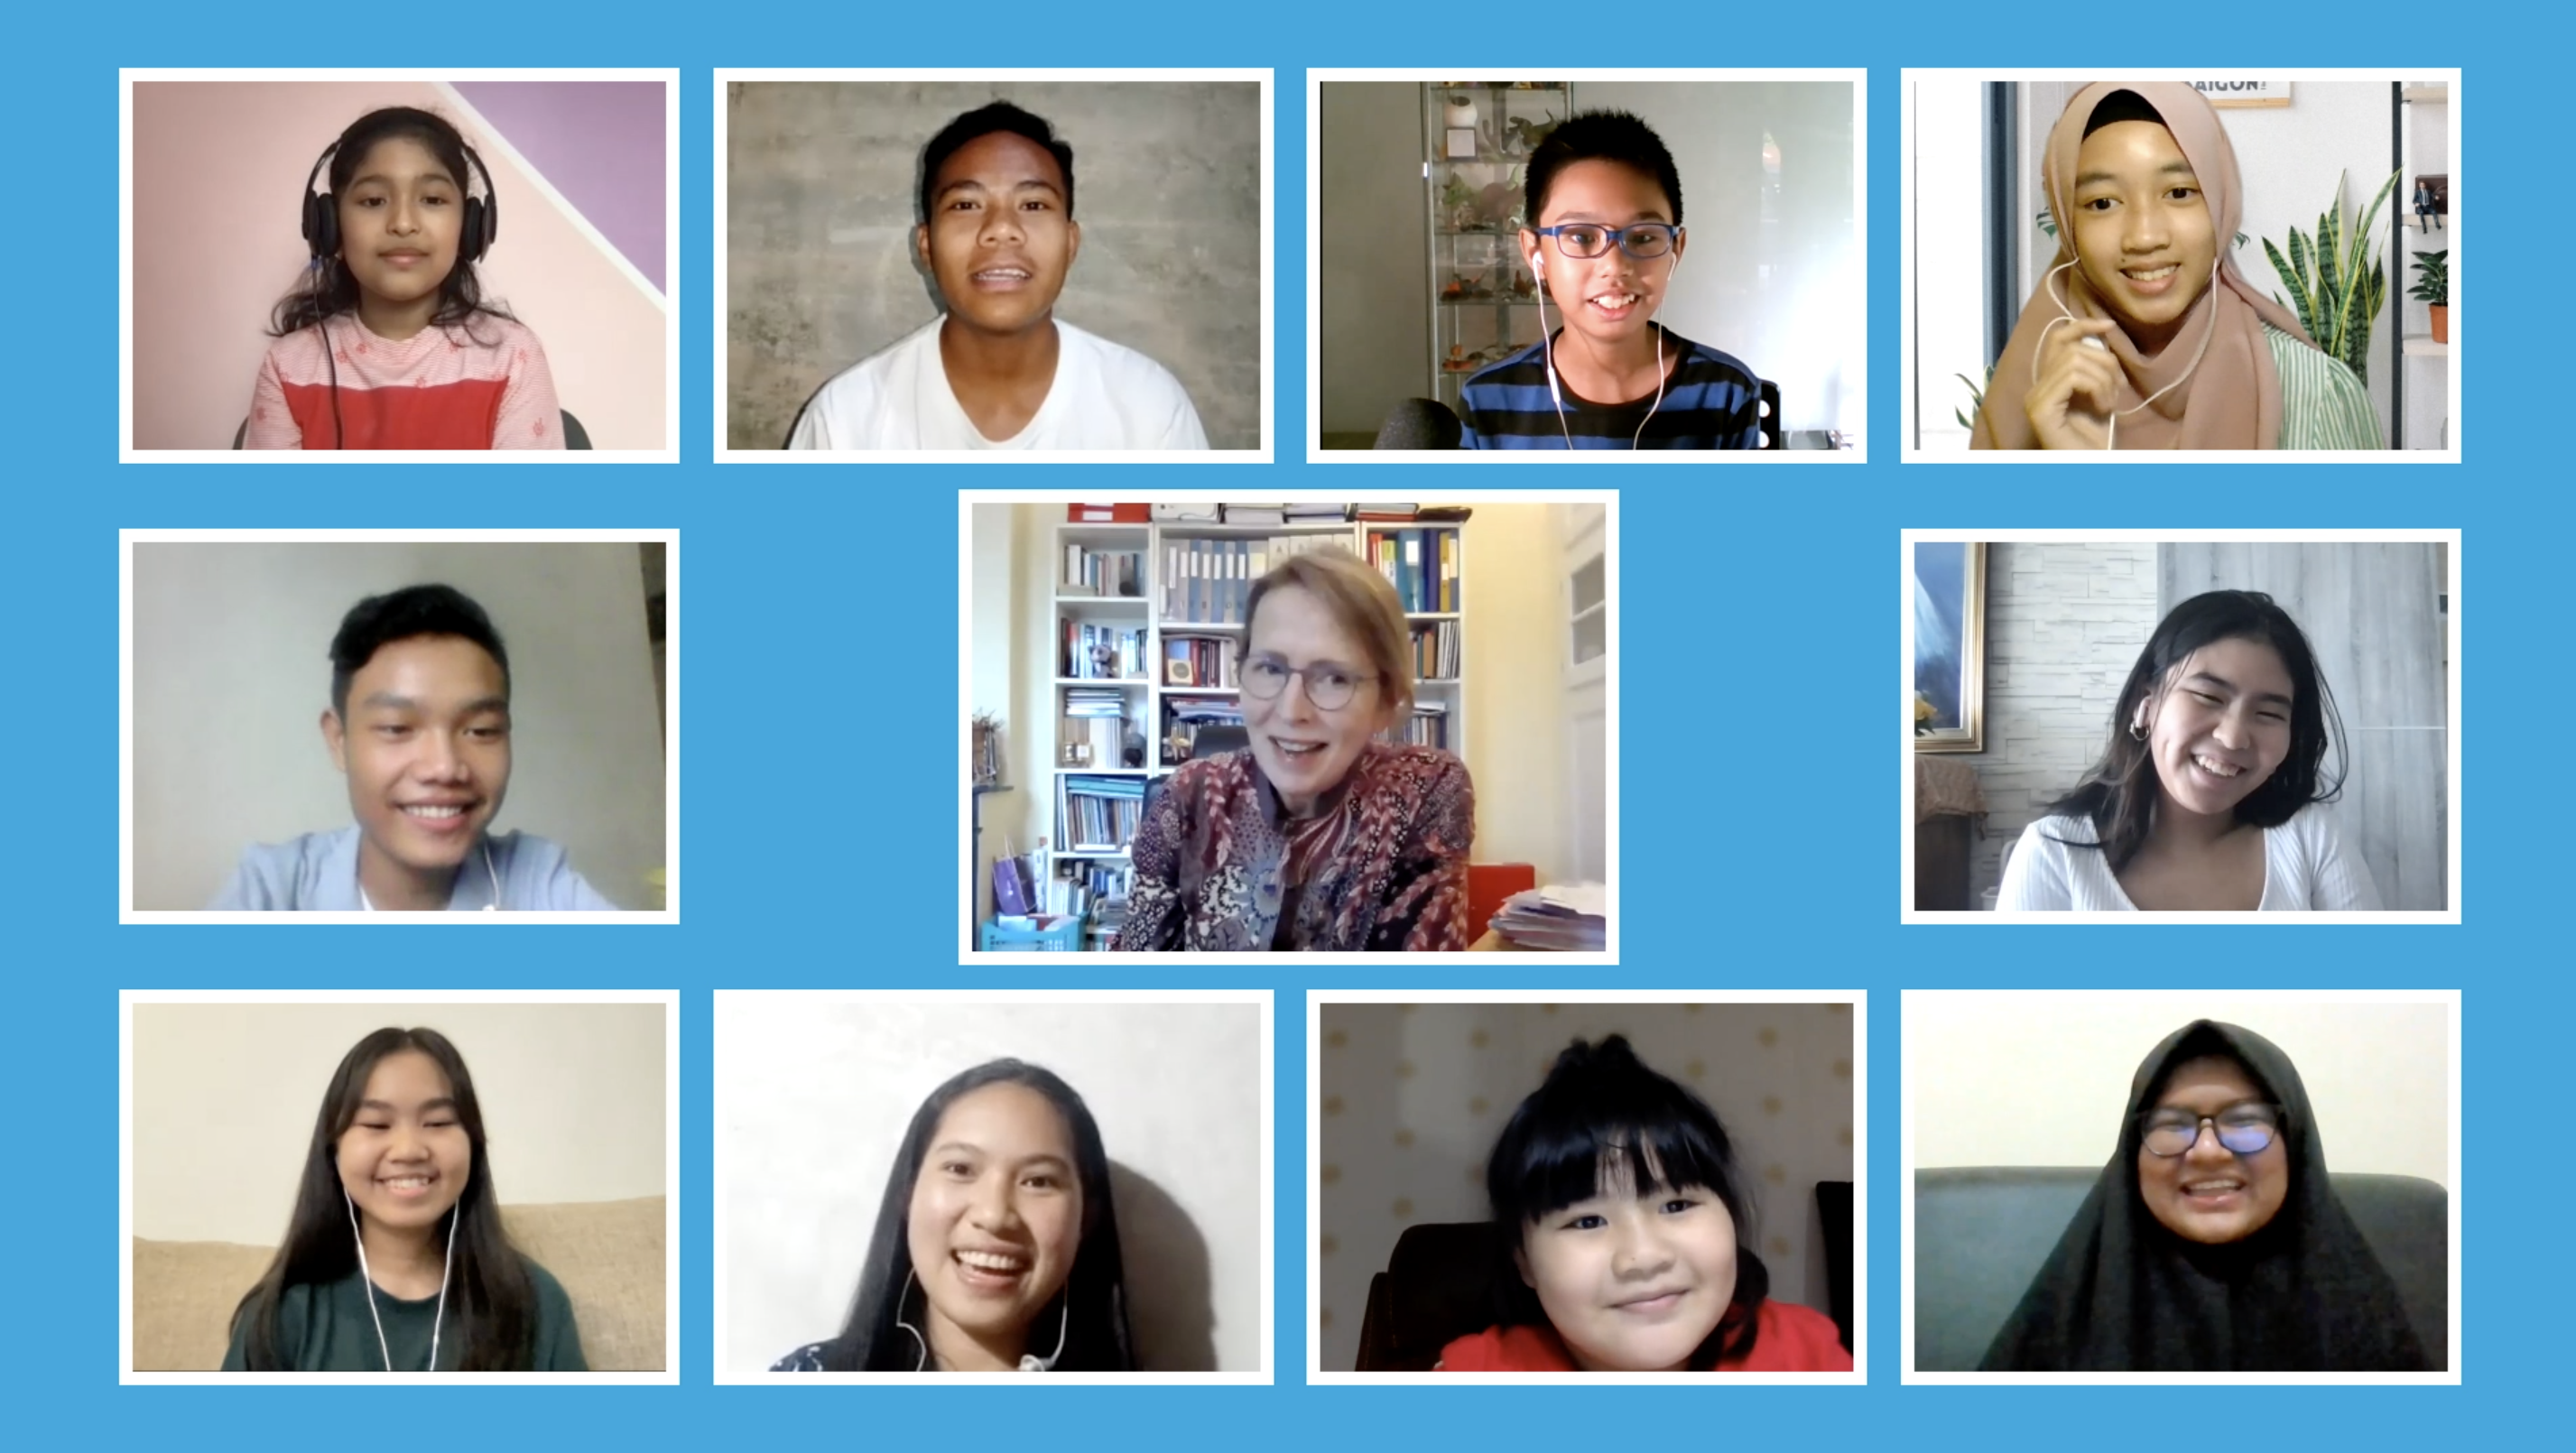 Watch: Young Indonesians Interview UN Resident Coordinator Valerie Julliand on National Children's Day